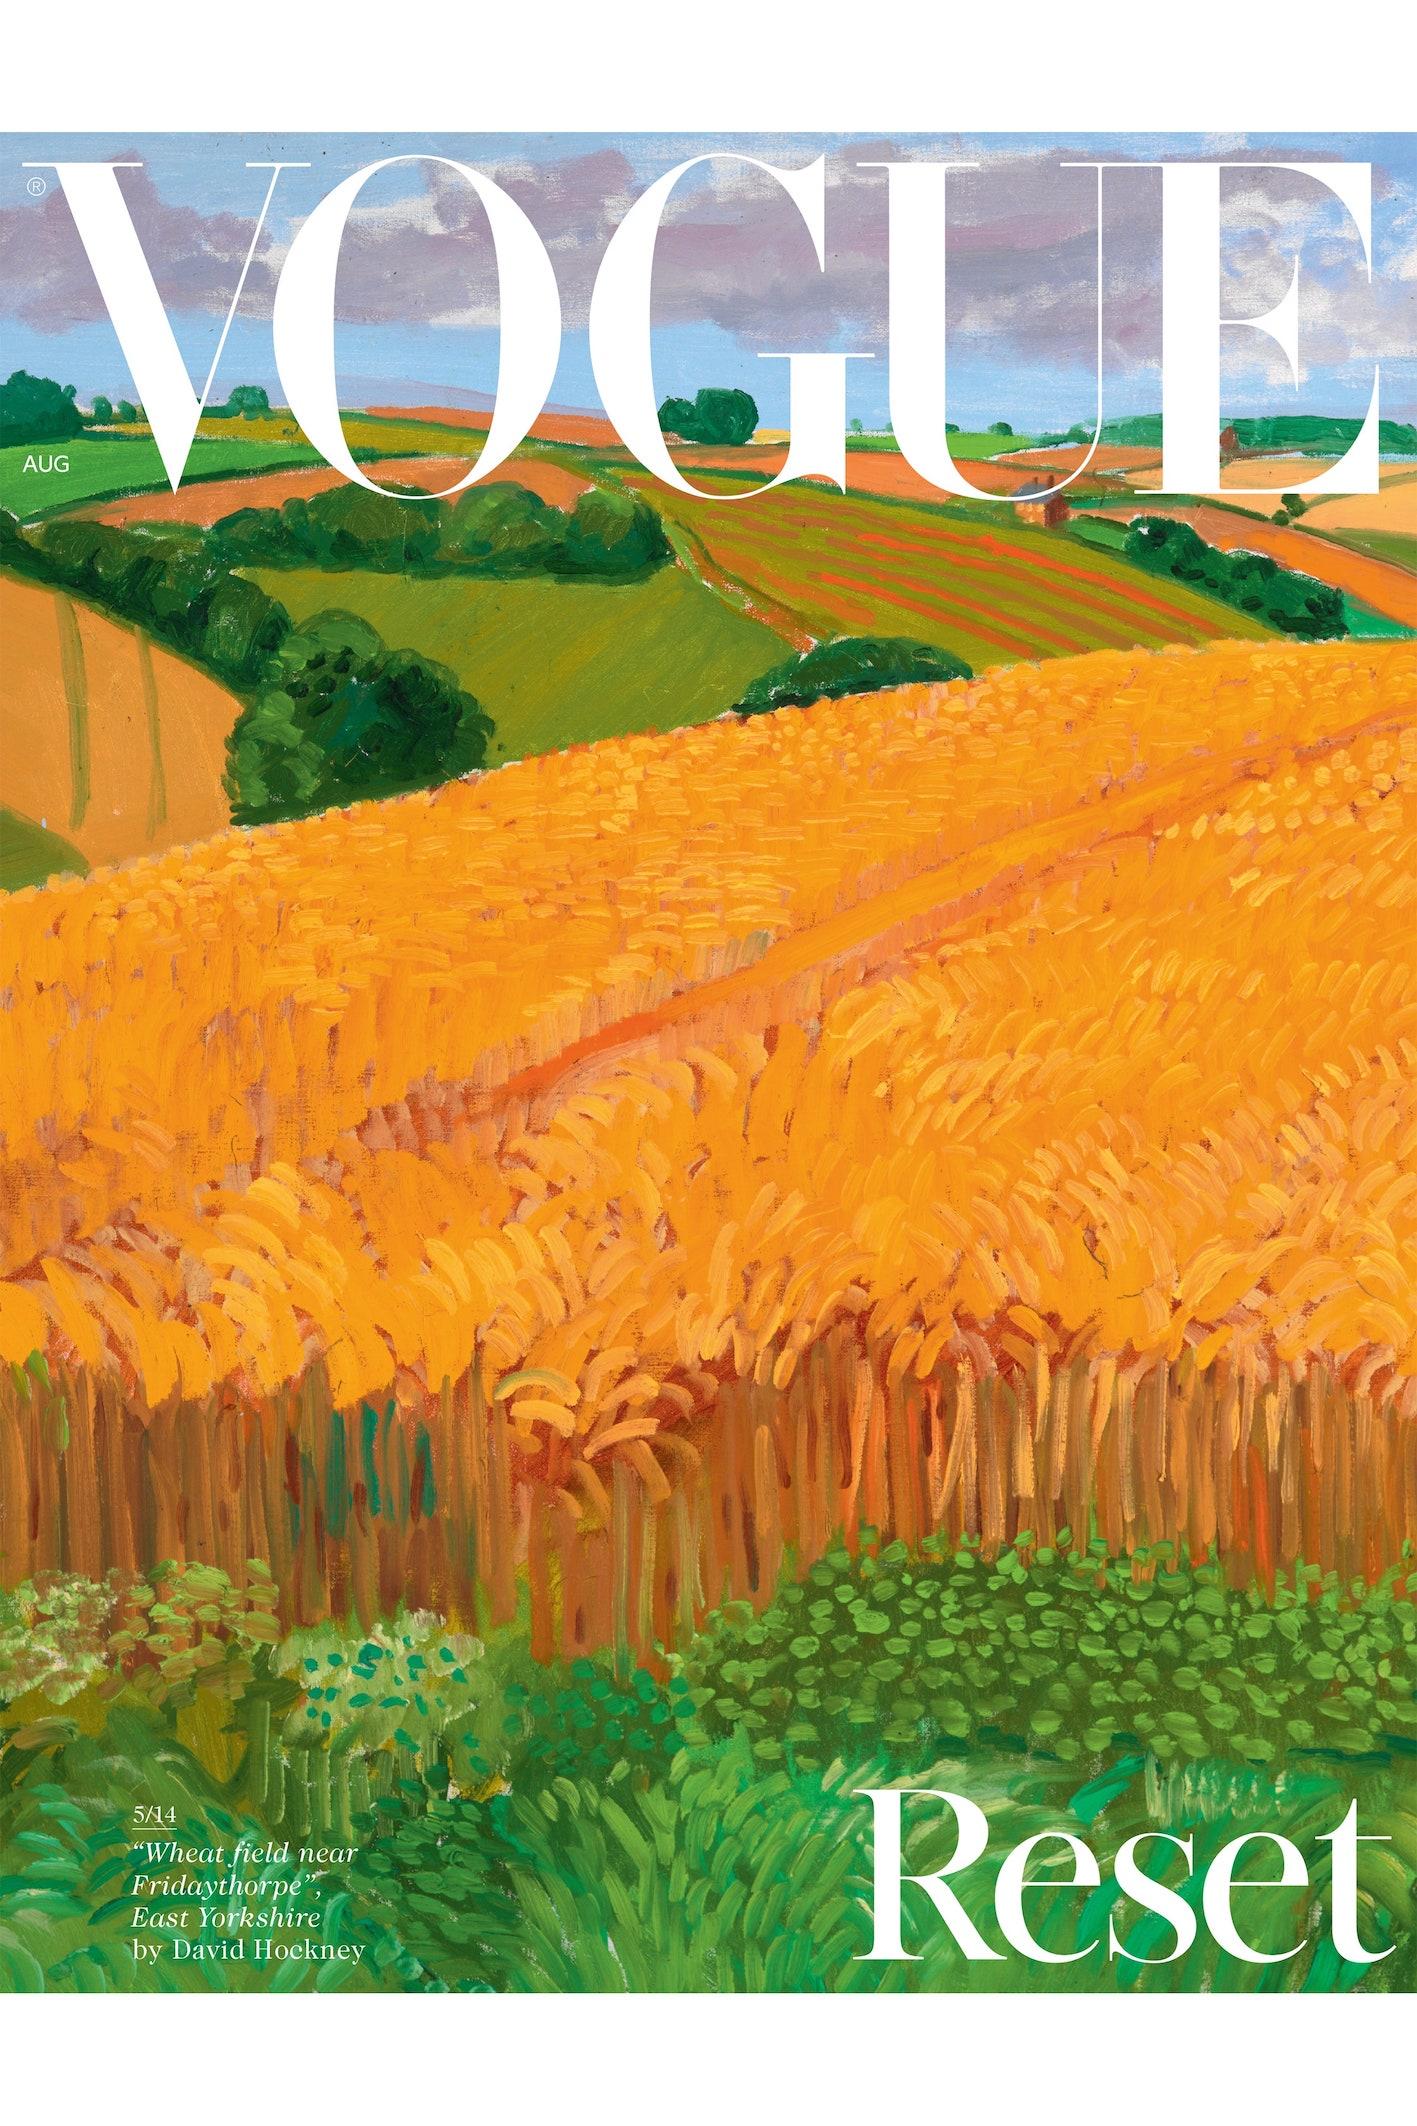 La cover di David Hockney per British Vogue - immagine via www.vogue.co.uk